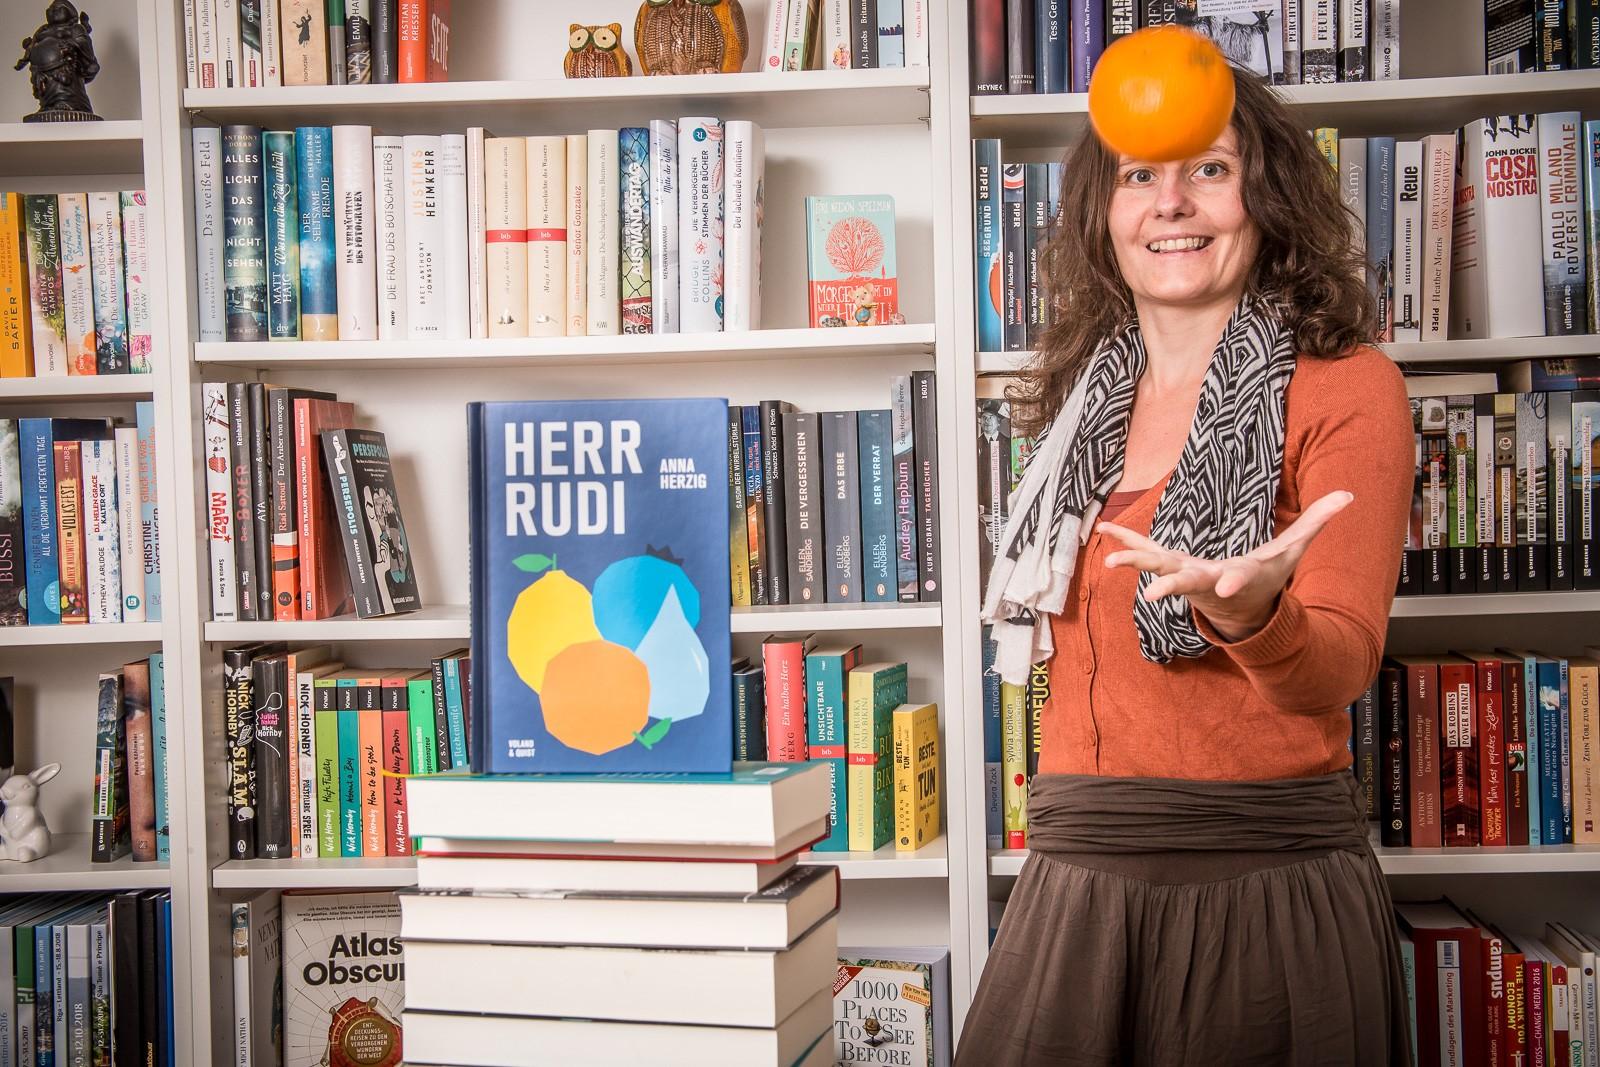 Herr Rudi - Anna Herzig